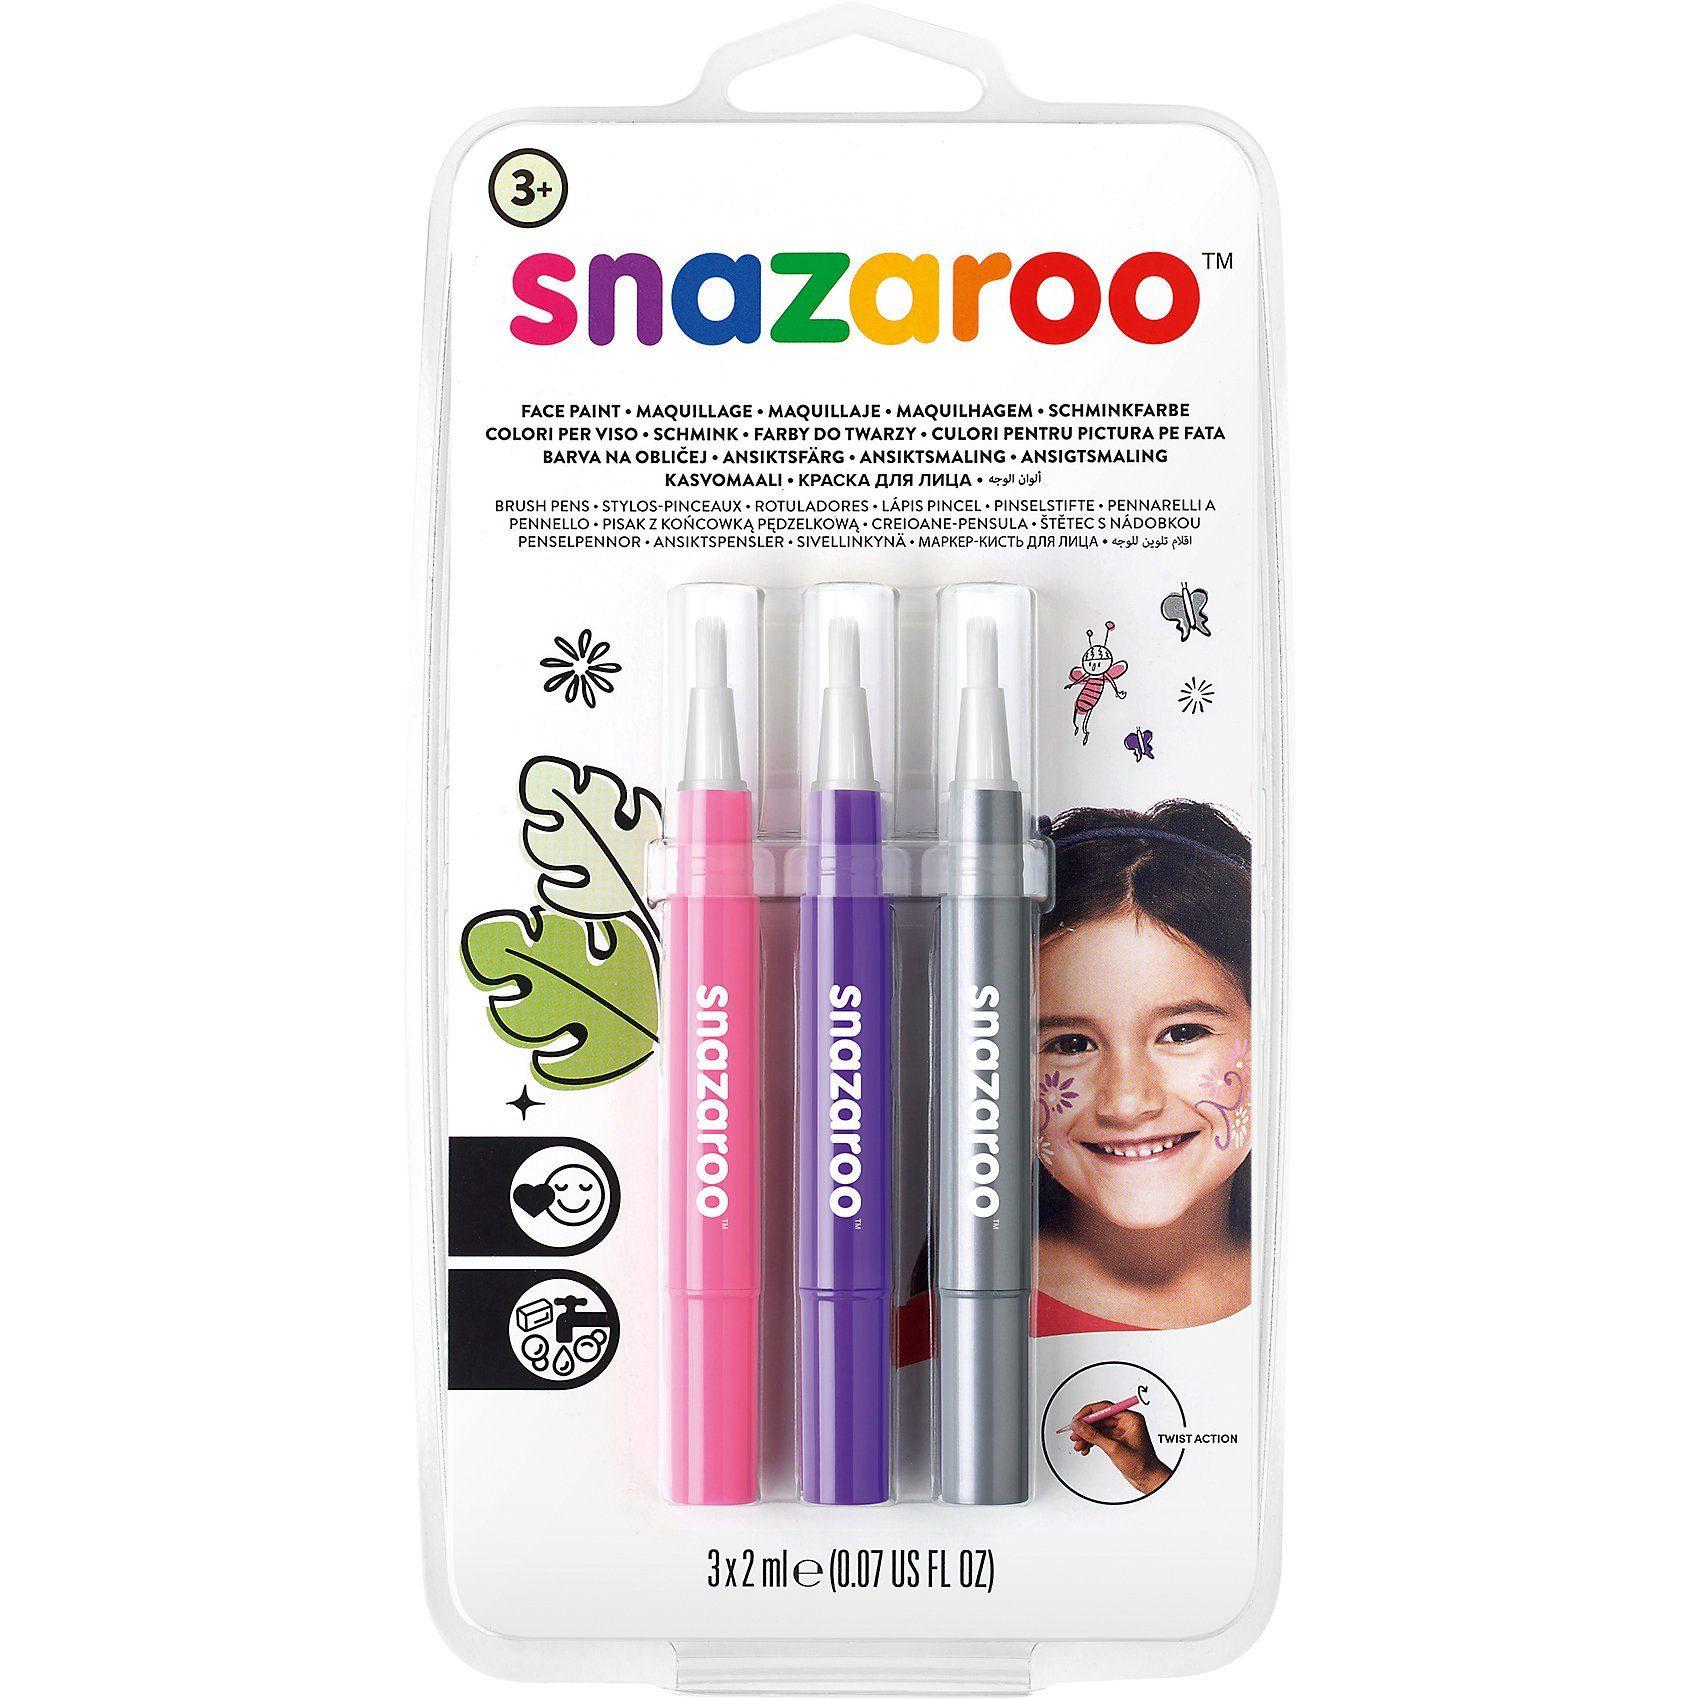 Snazaroo Pinsel Schminkstift-Set Fantasie, 3 Stück